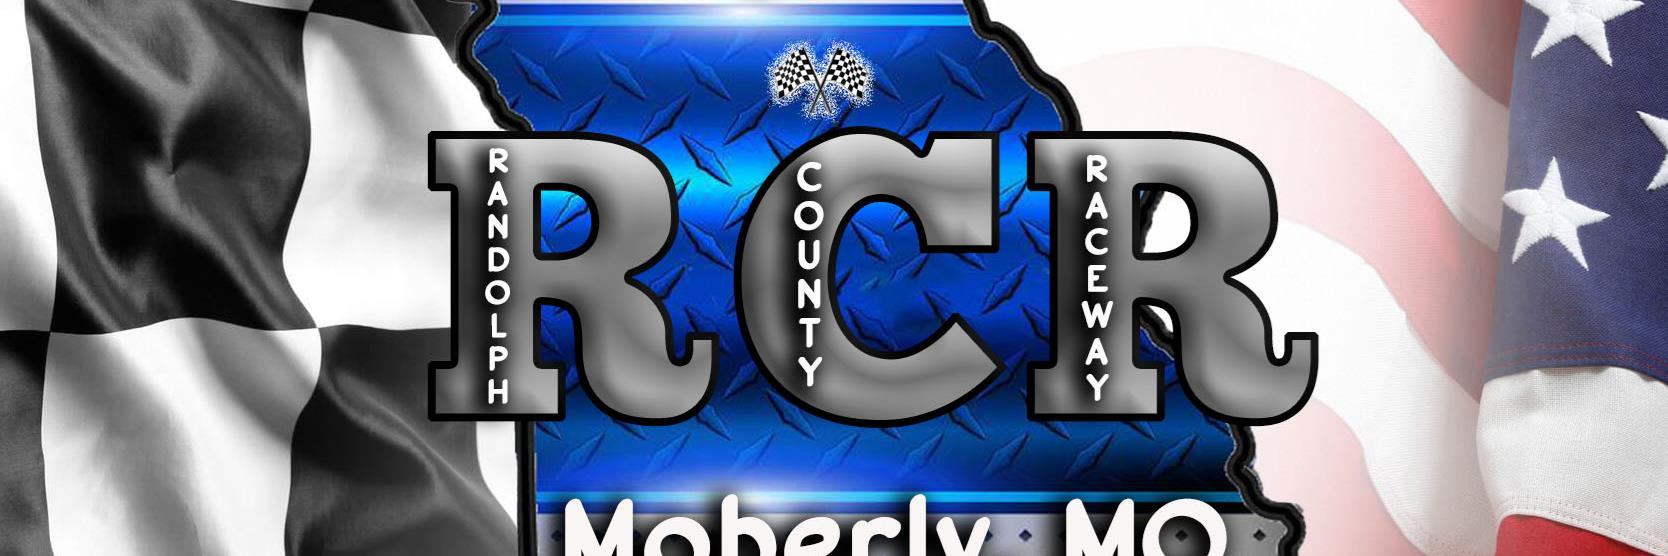 10/16/2021 - Randolph County Raceway